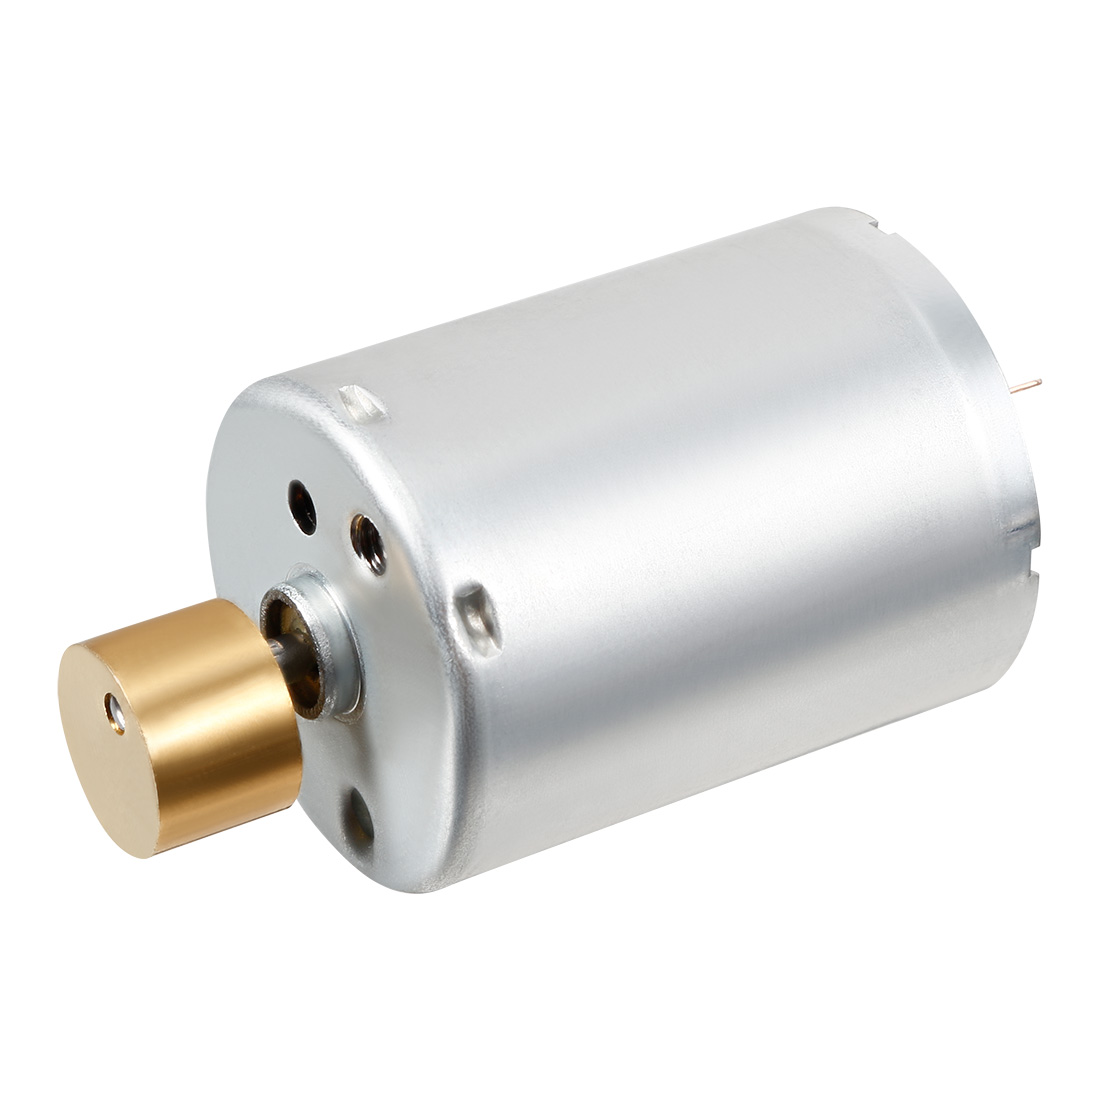 Vibration-Motor-DC3V-6V-12V-5000-15000RPM-Electric-Micro-Strong-Vibrating-Motor